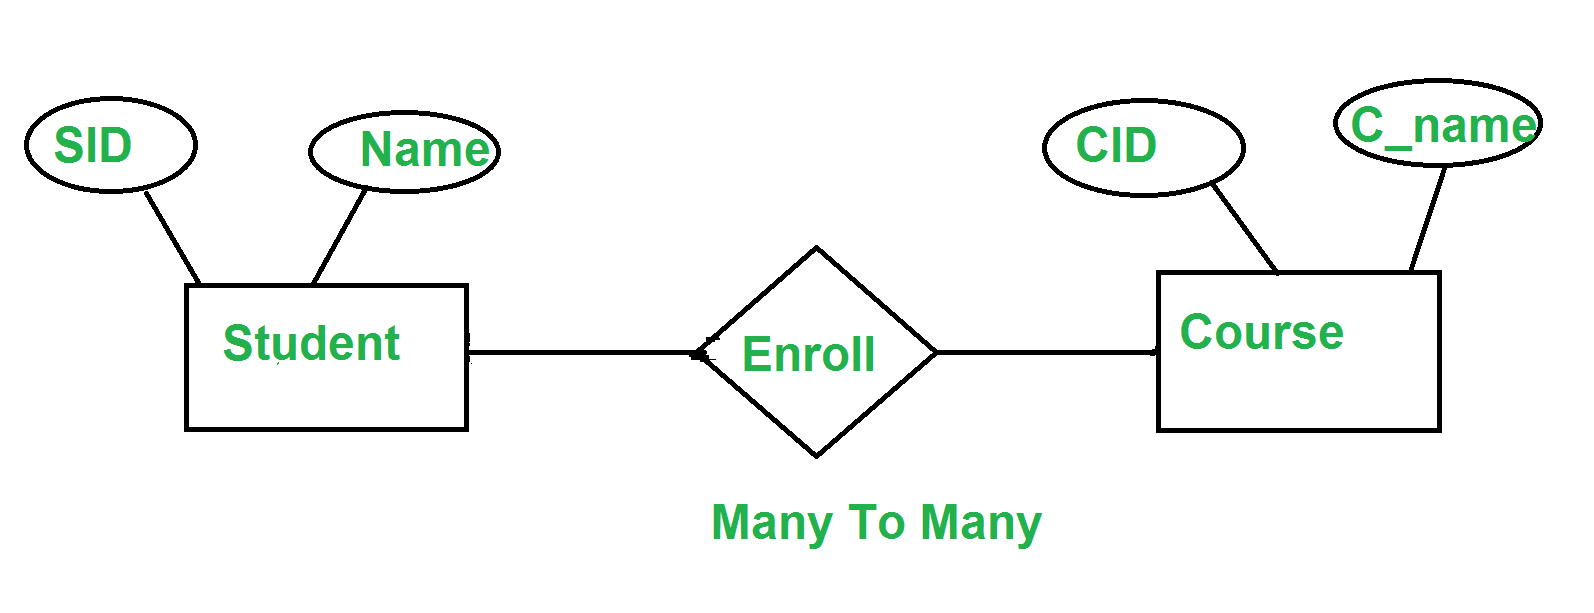 Minimization Of Er Diagrams - Geeksforgeeks within Er Diagram Partial Key